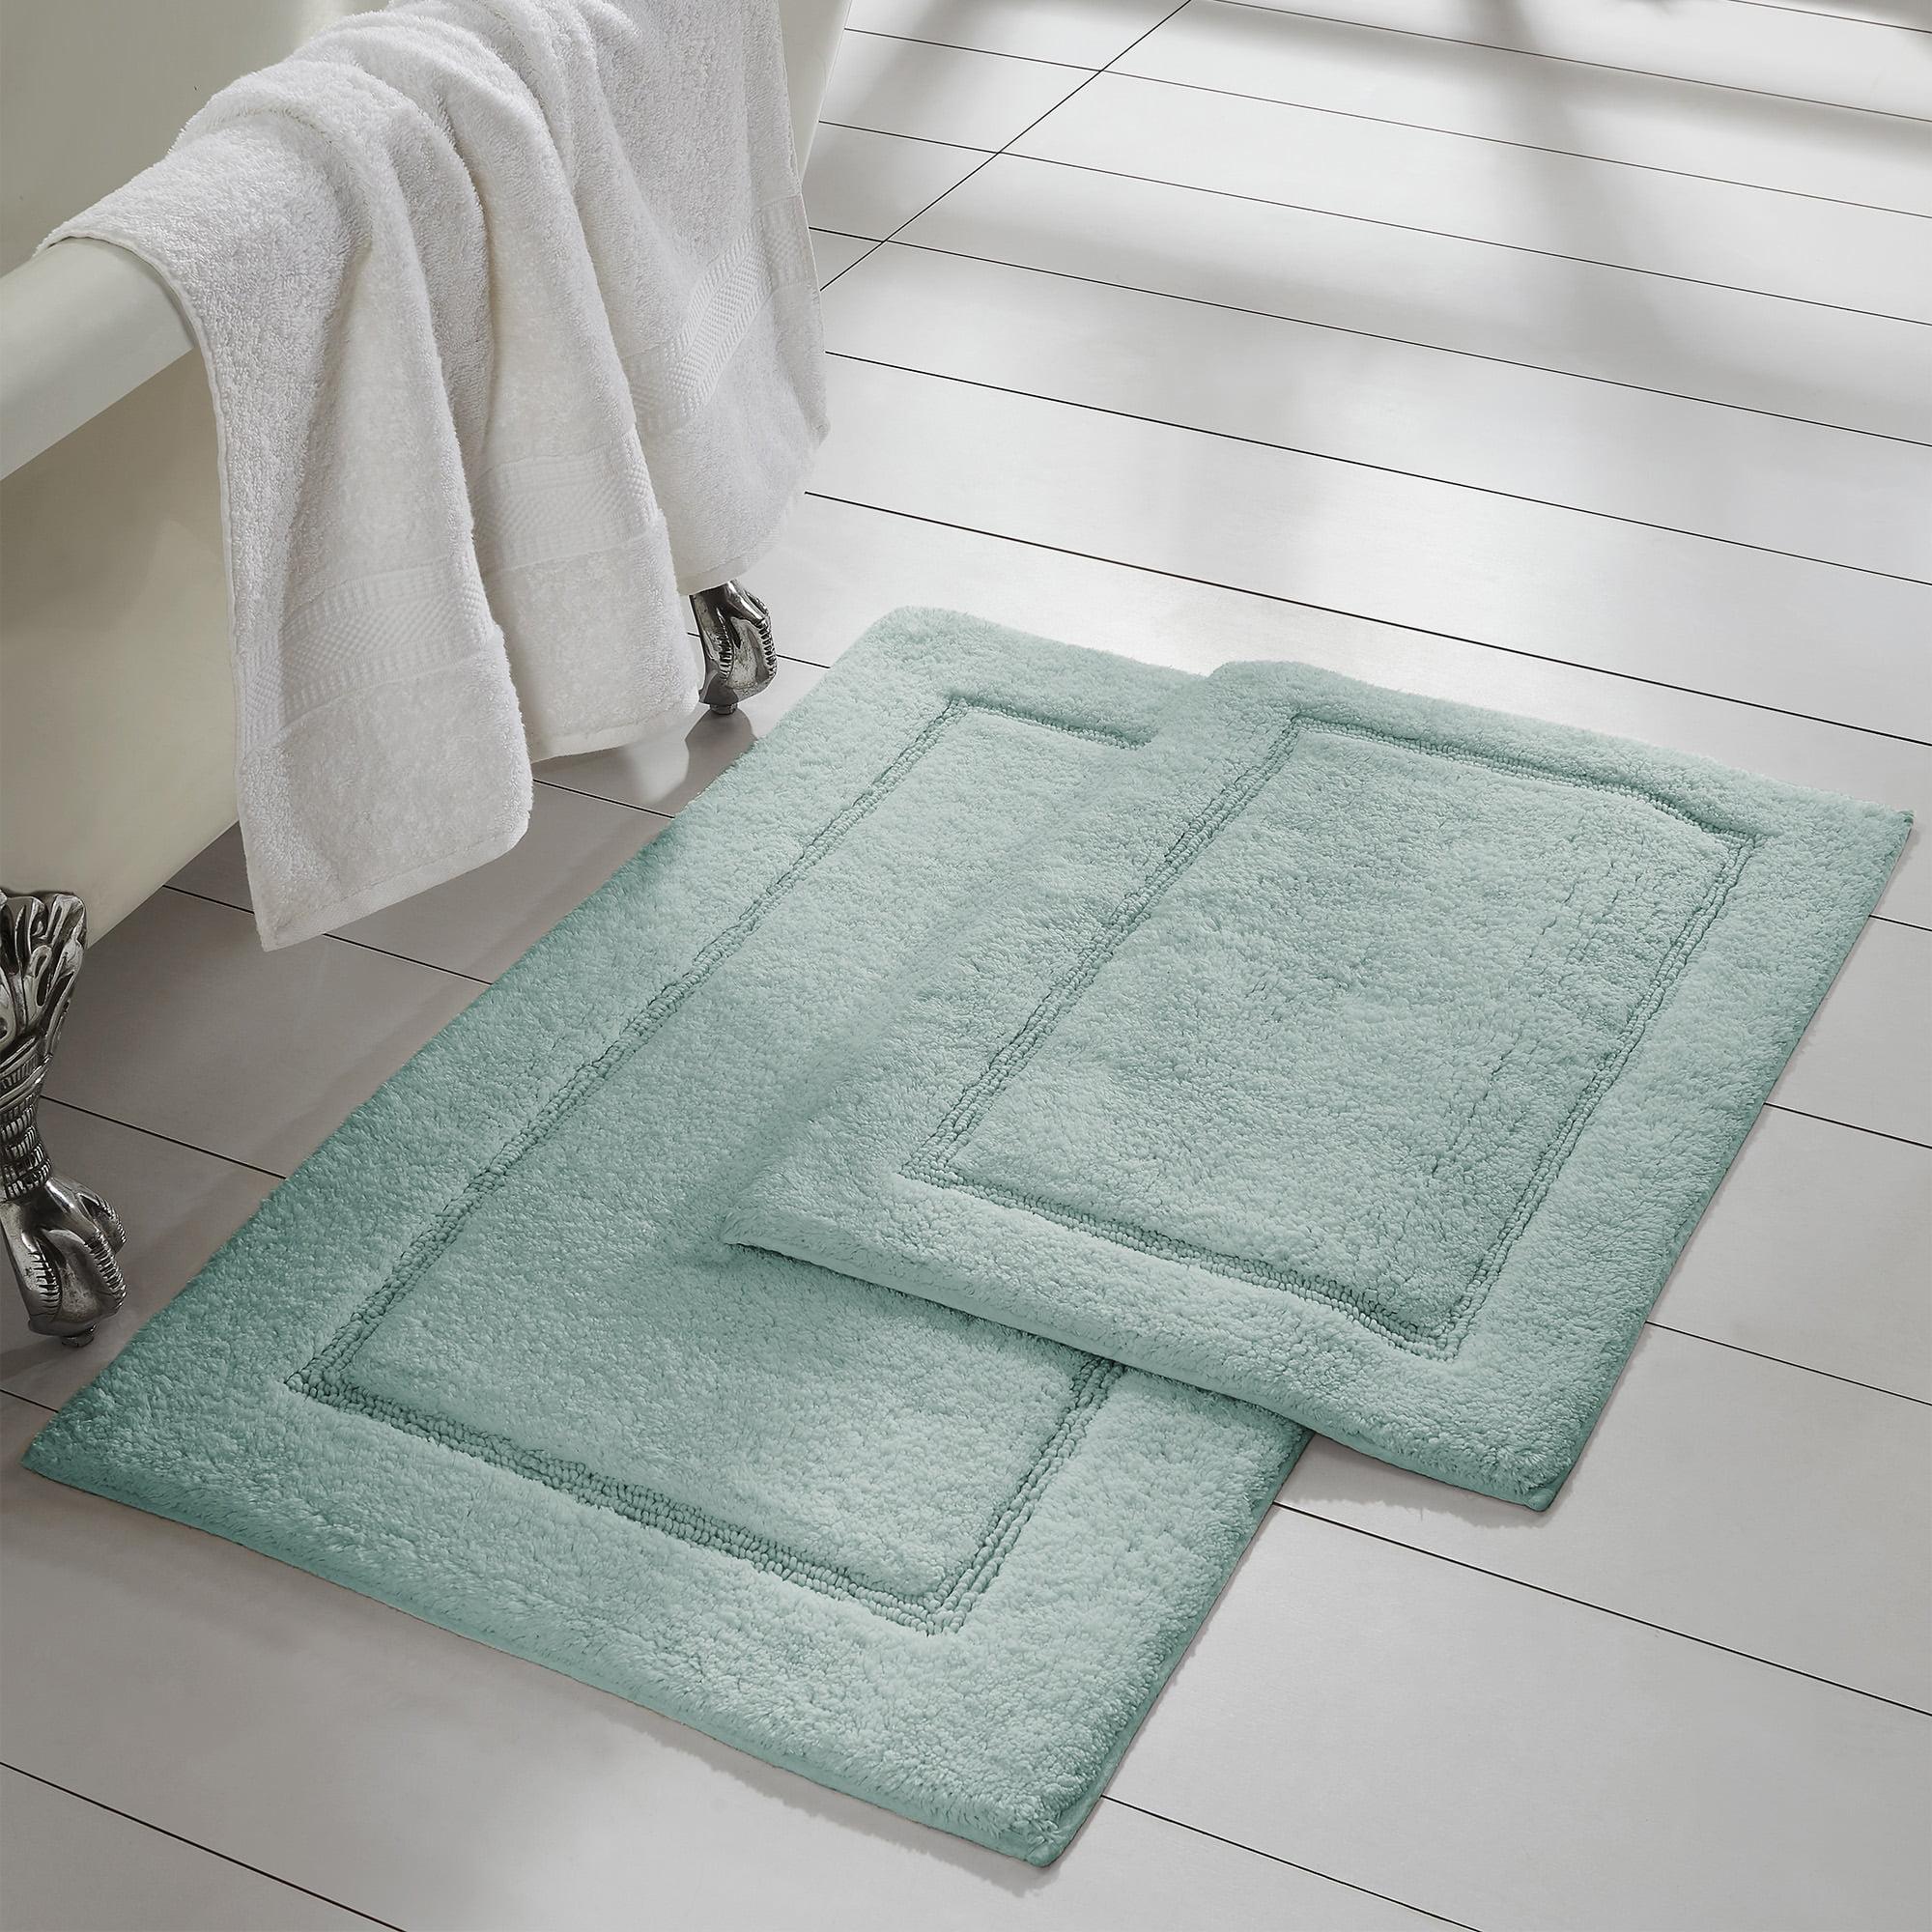 2 Piece Non Slip Cotton Bath Rug Set 17 X 24 21 X 34 White Walmart Com Walmart Com